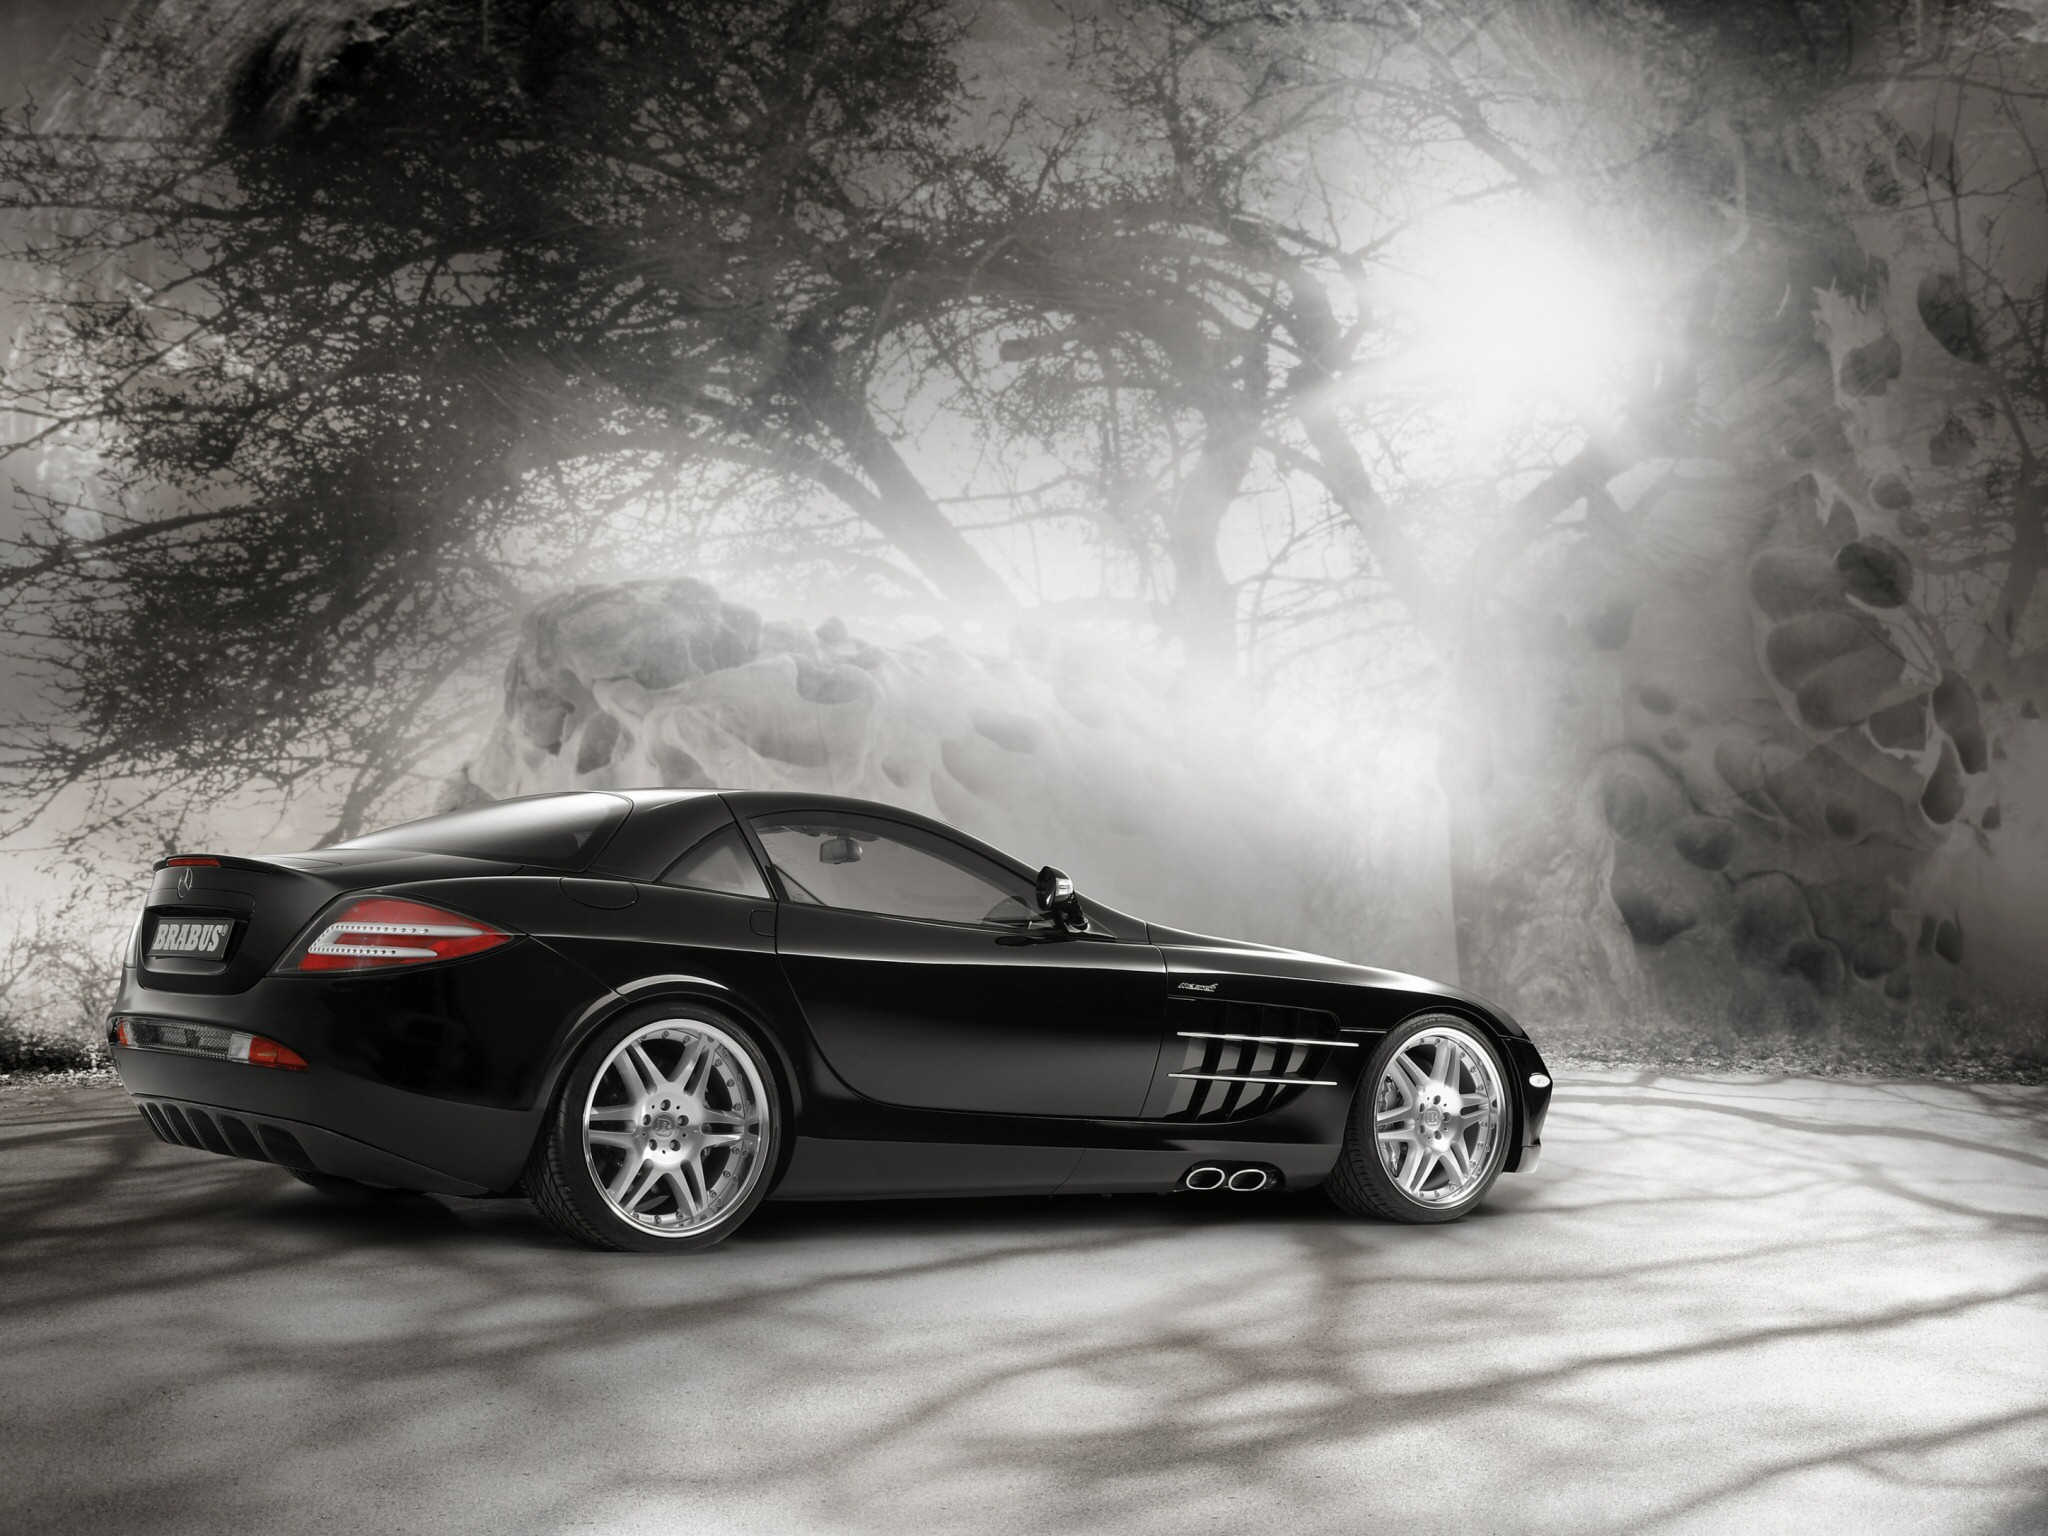 Fahrzeuge - Mercedes-Benz Slr  - Mercedes Hintergrundbild